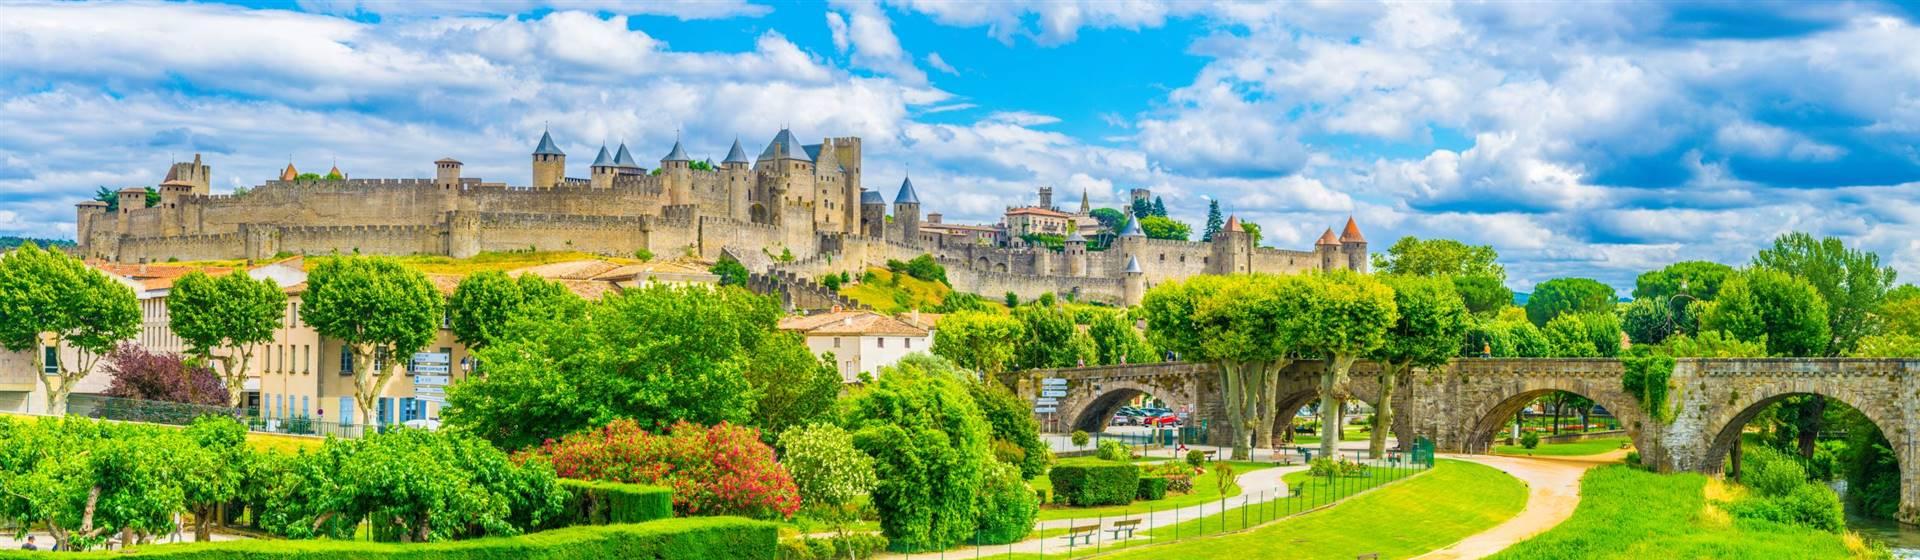 "<img src=""carcassonnetownandcastle-shutterstock.jpeg"" alt=""Carcassonne Castle""/>"